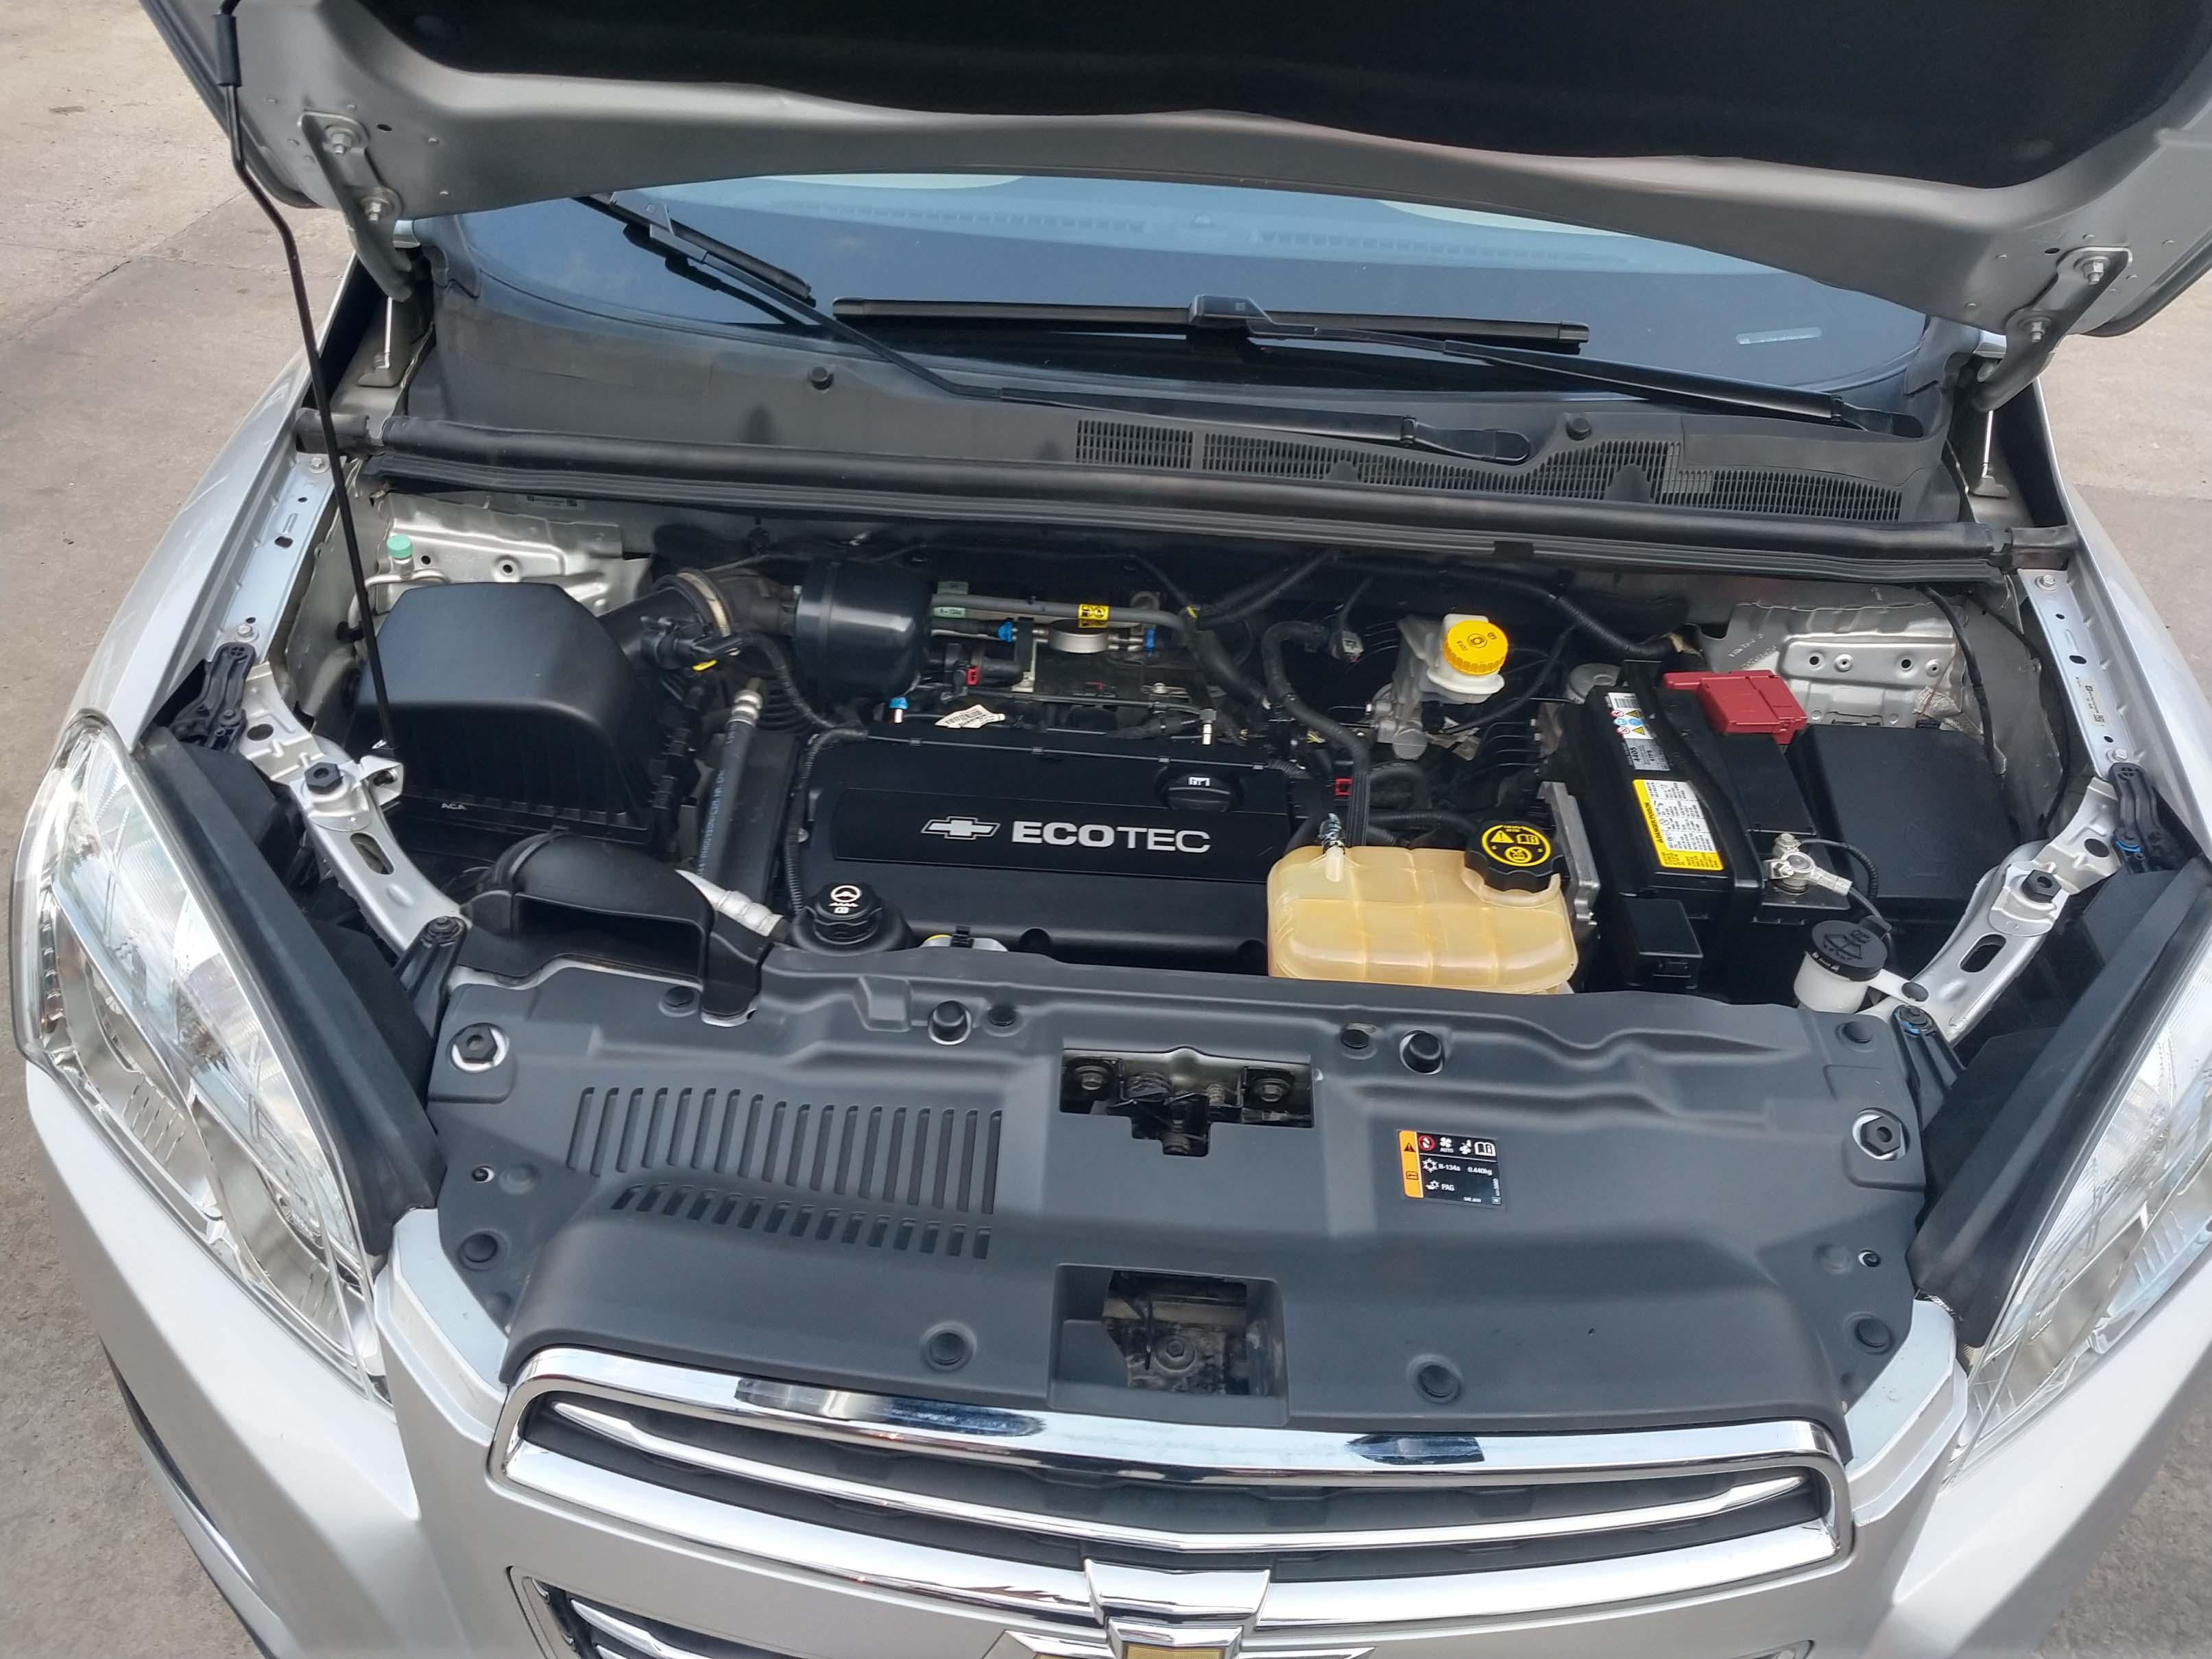 2017 CHEVROLET TRACKER FWD LTZ 1,8